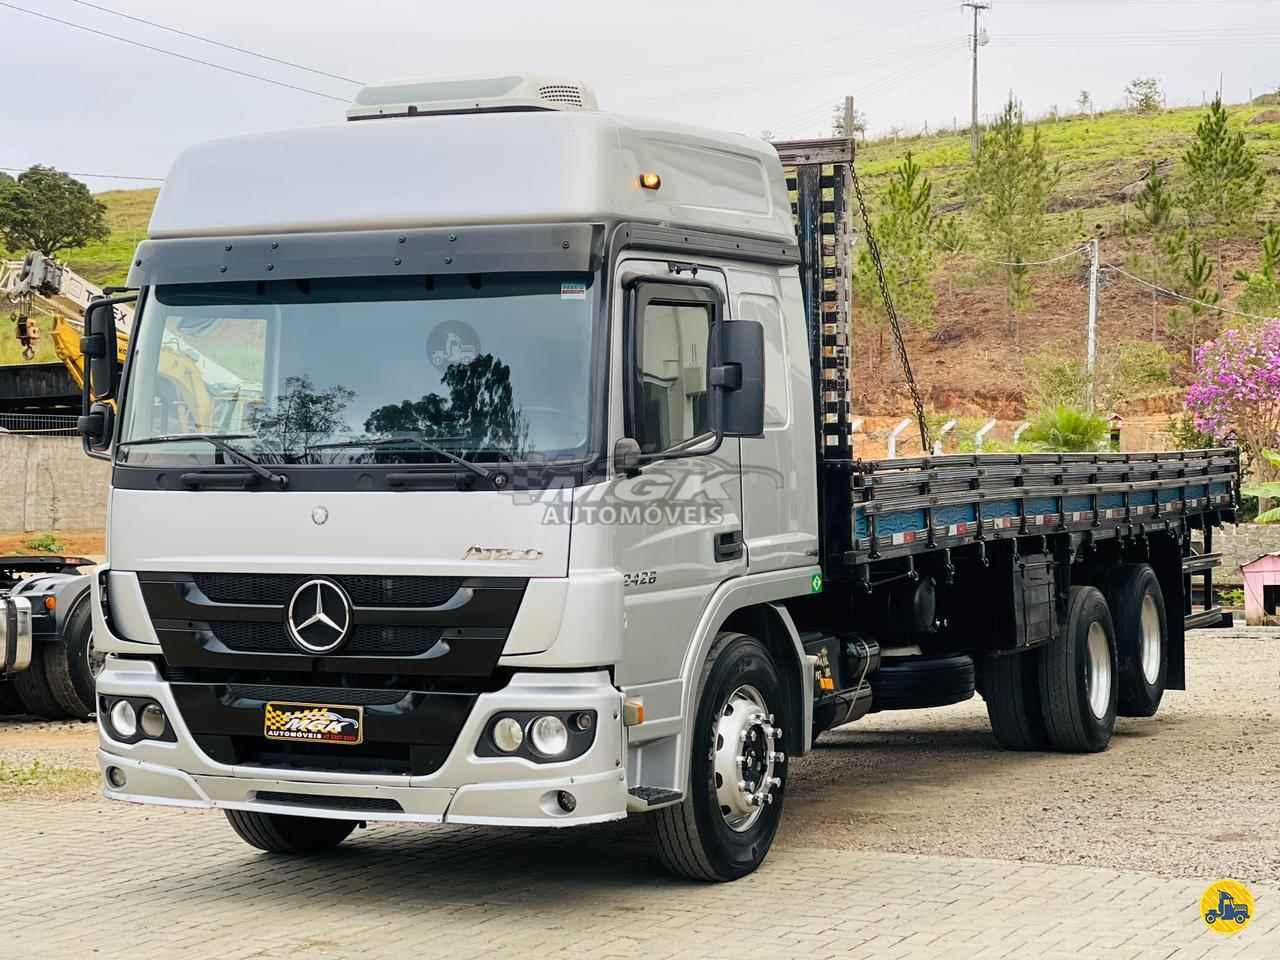 CAMINHAO MERCEDES-BENZ MB 2426 Carga Seca Truck 6x2 MGK Automóveis IBIRAMA SANTA CATARINA SC